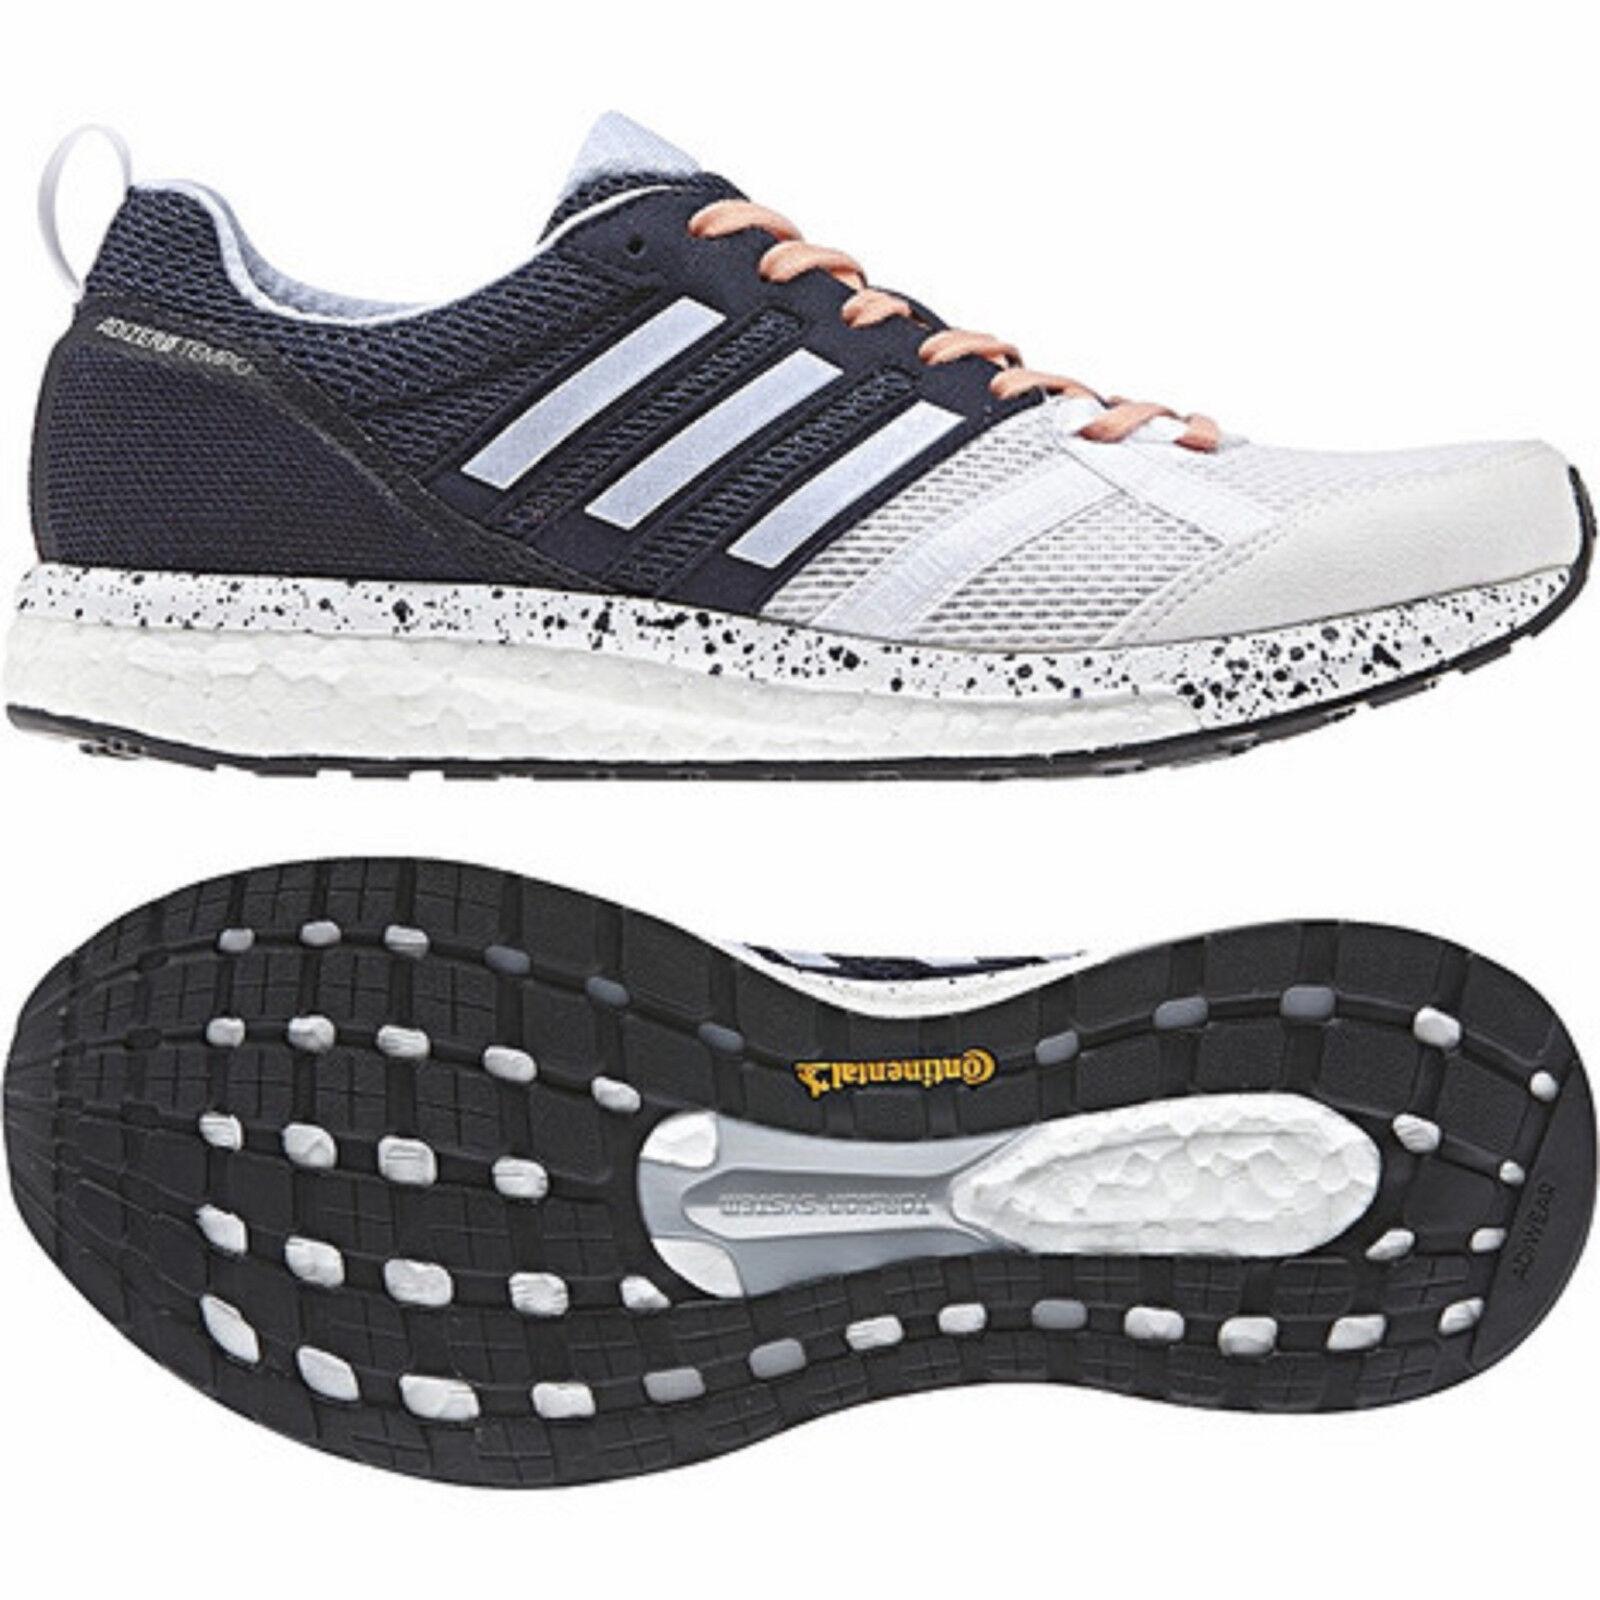 Adidas 2017 Adizero Boost Running shoes White bluee Peach CP9499 Women's Size 7